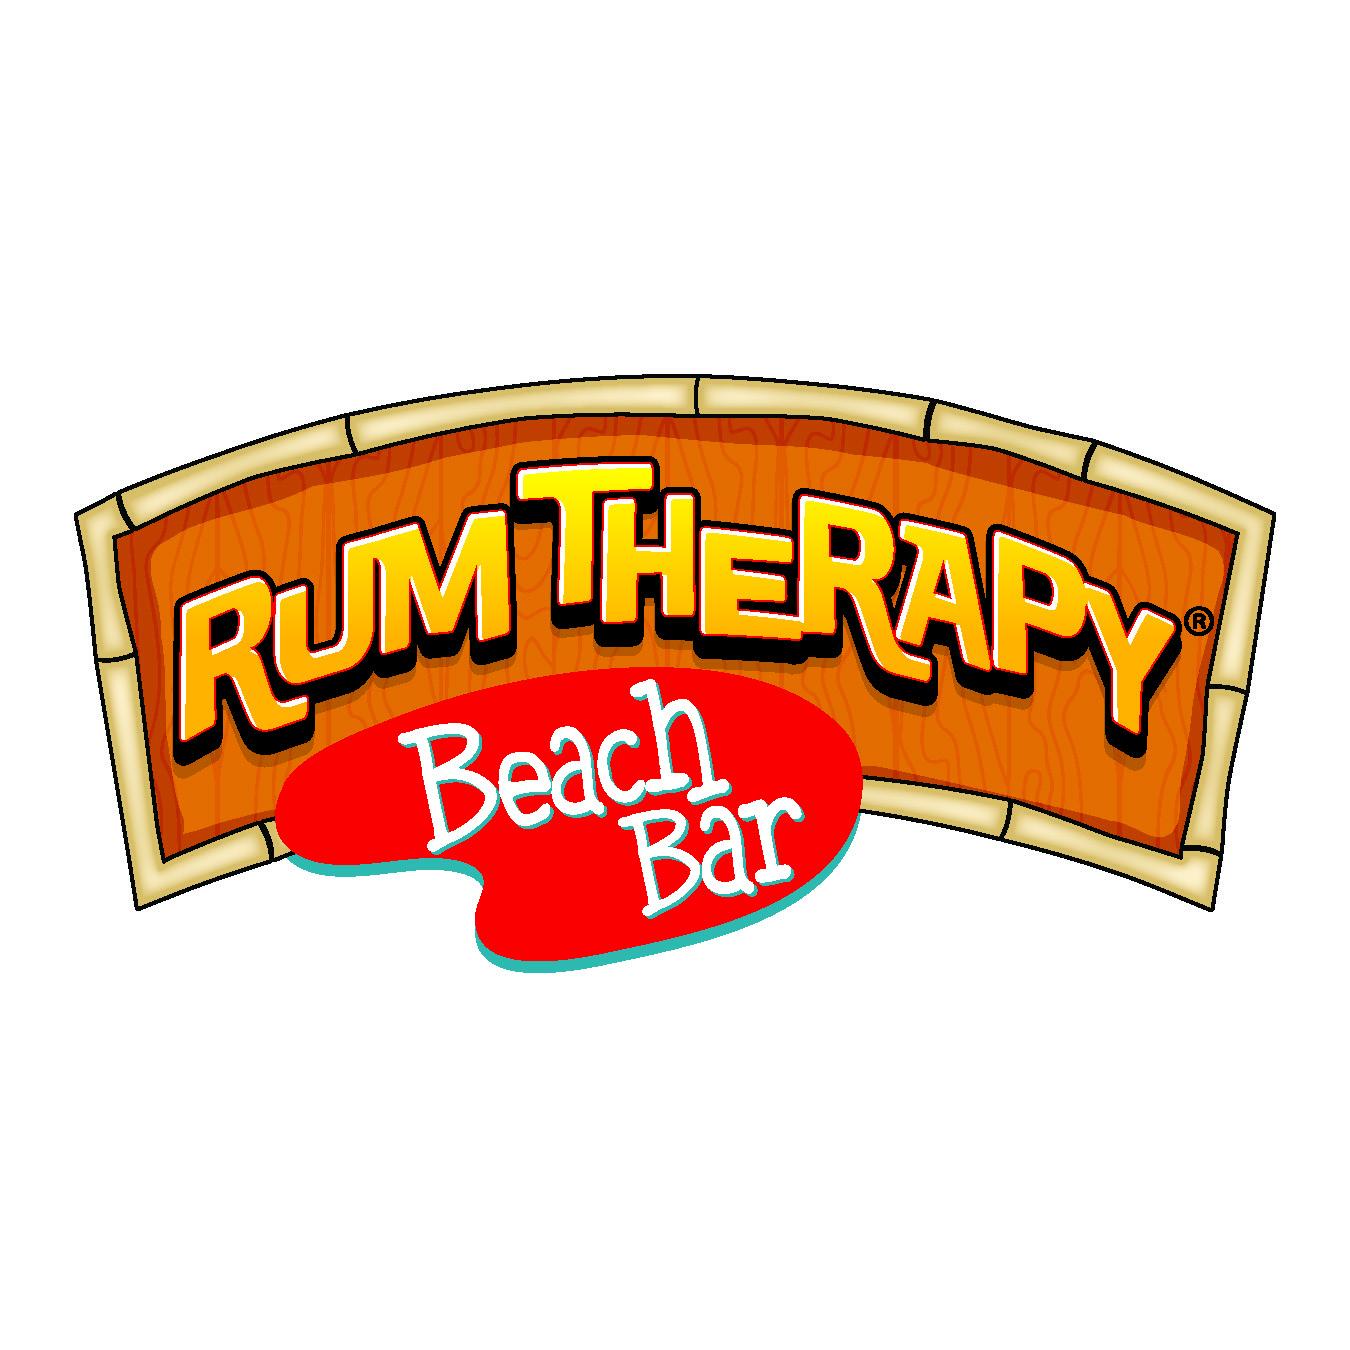 RumTherapy_BeachBar_FT_T-ShirtFiles_Page_1.jpg